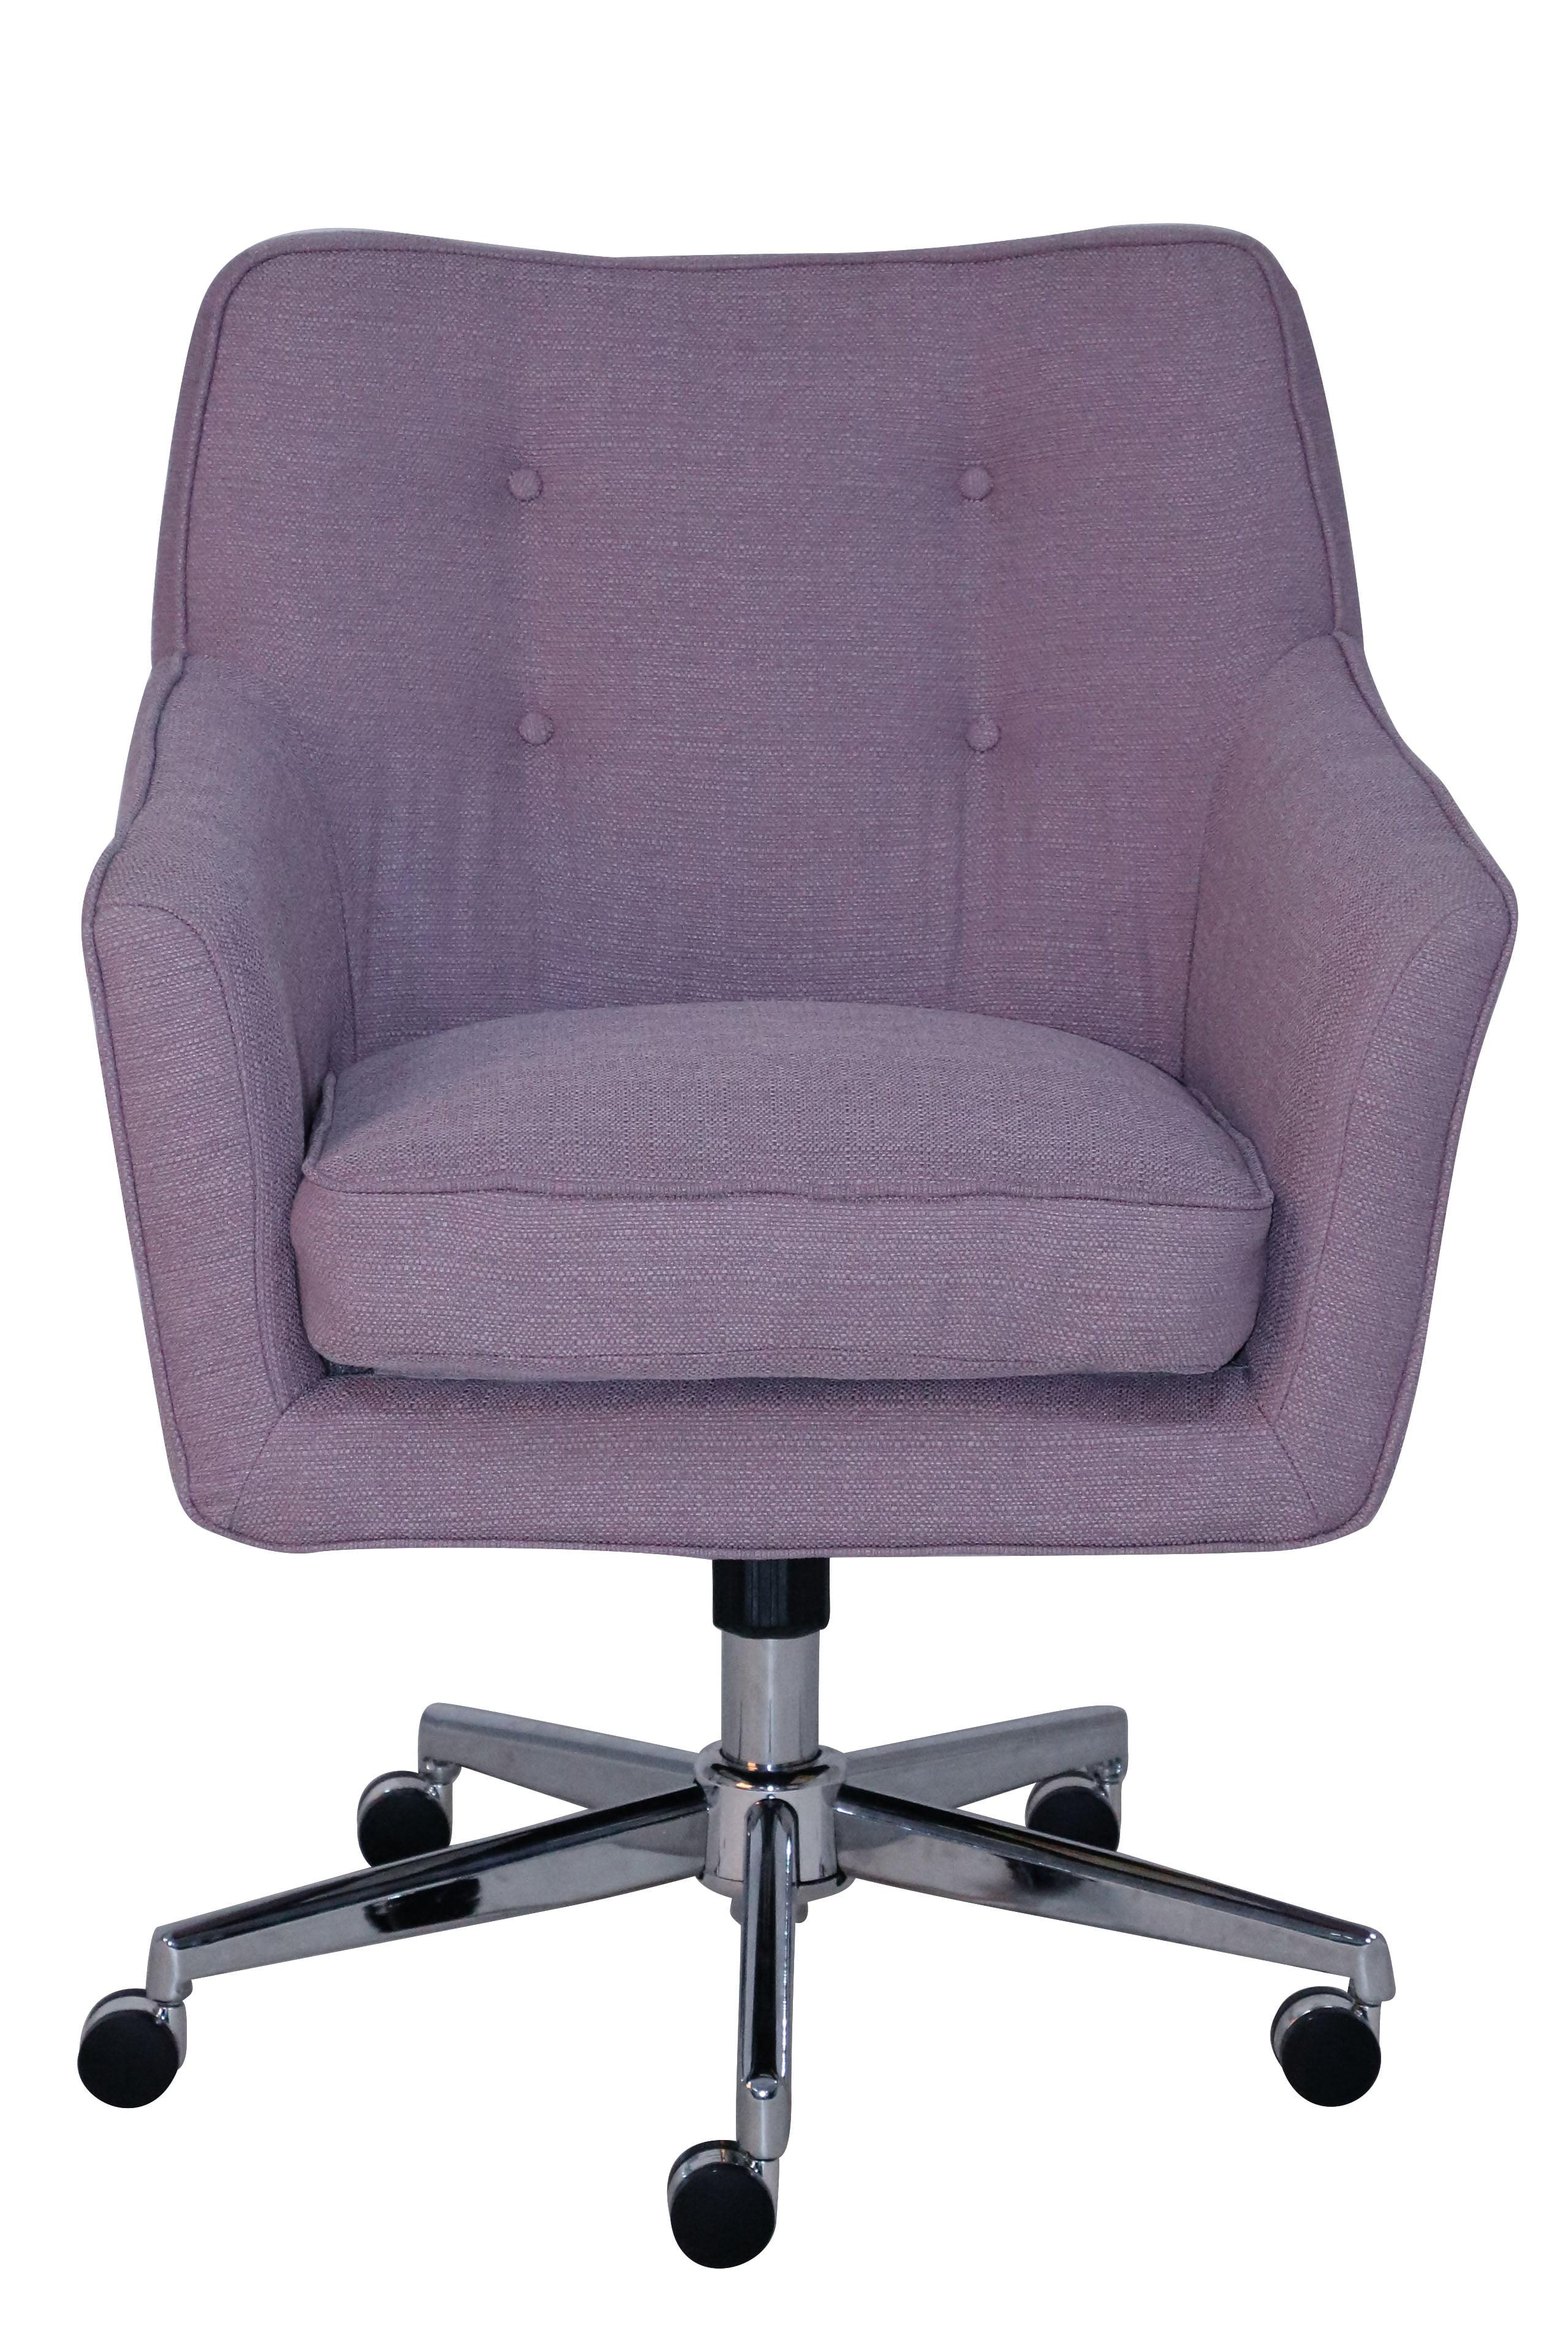 Serta Style Ashland Home Office Chair Lilac Twill Fabric Walmart Com Walmart Com